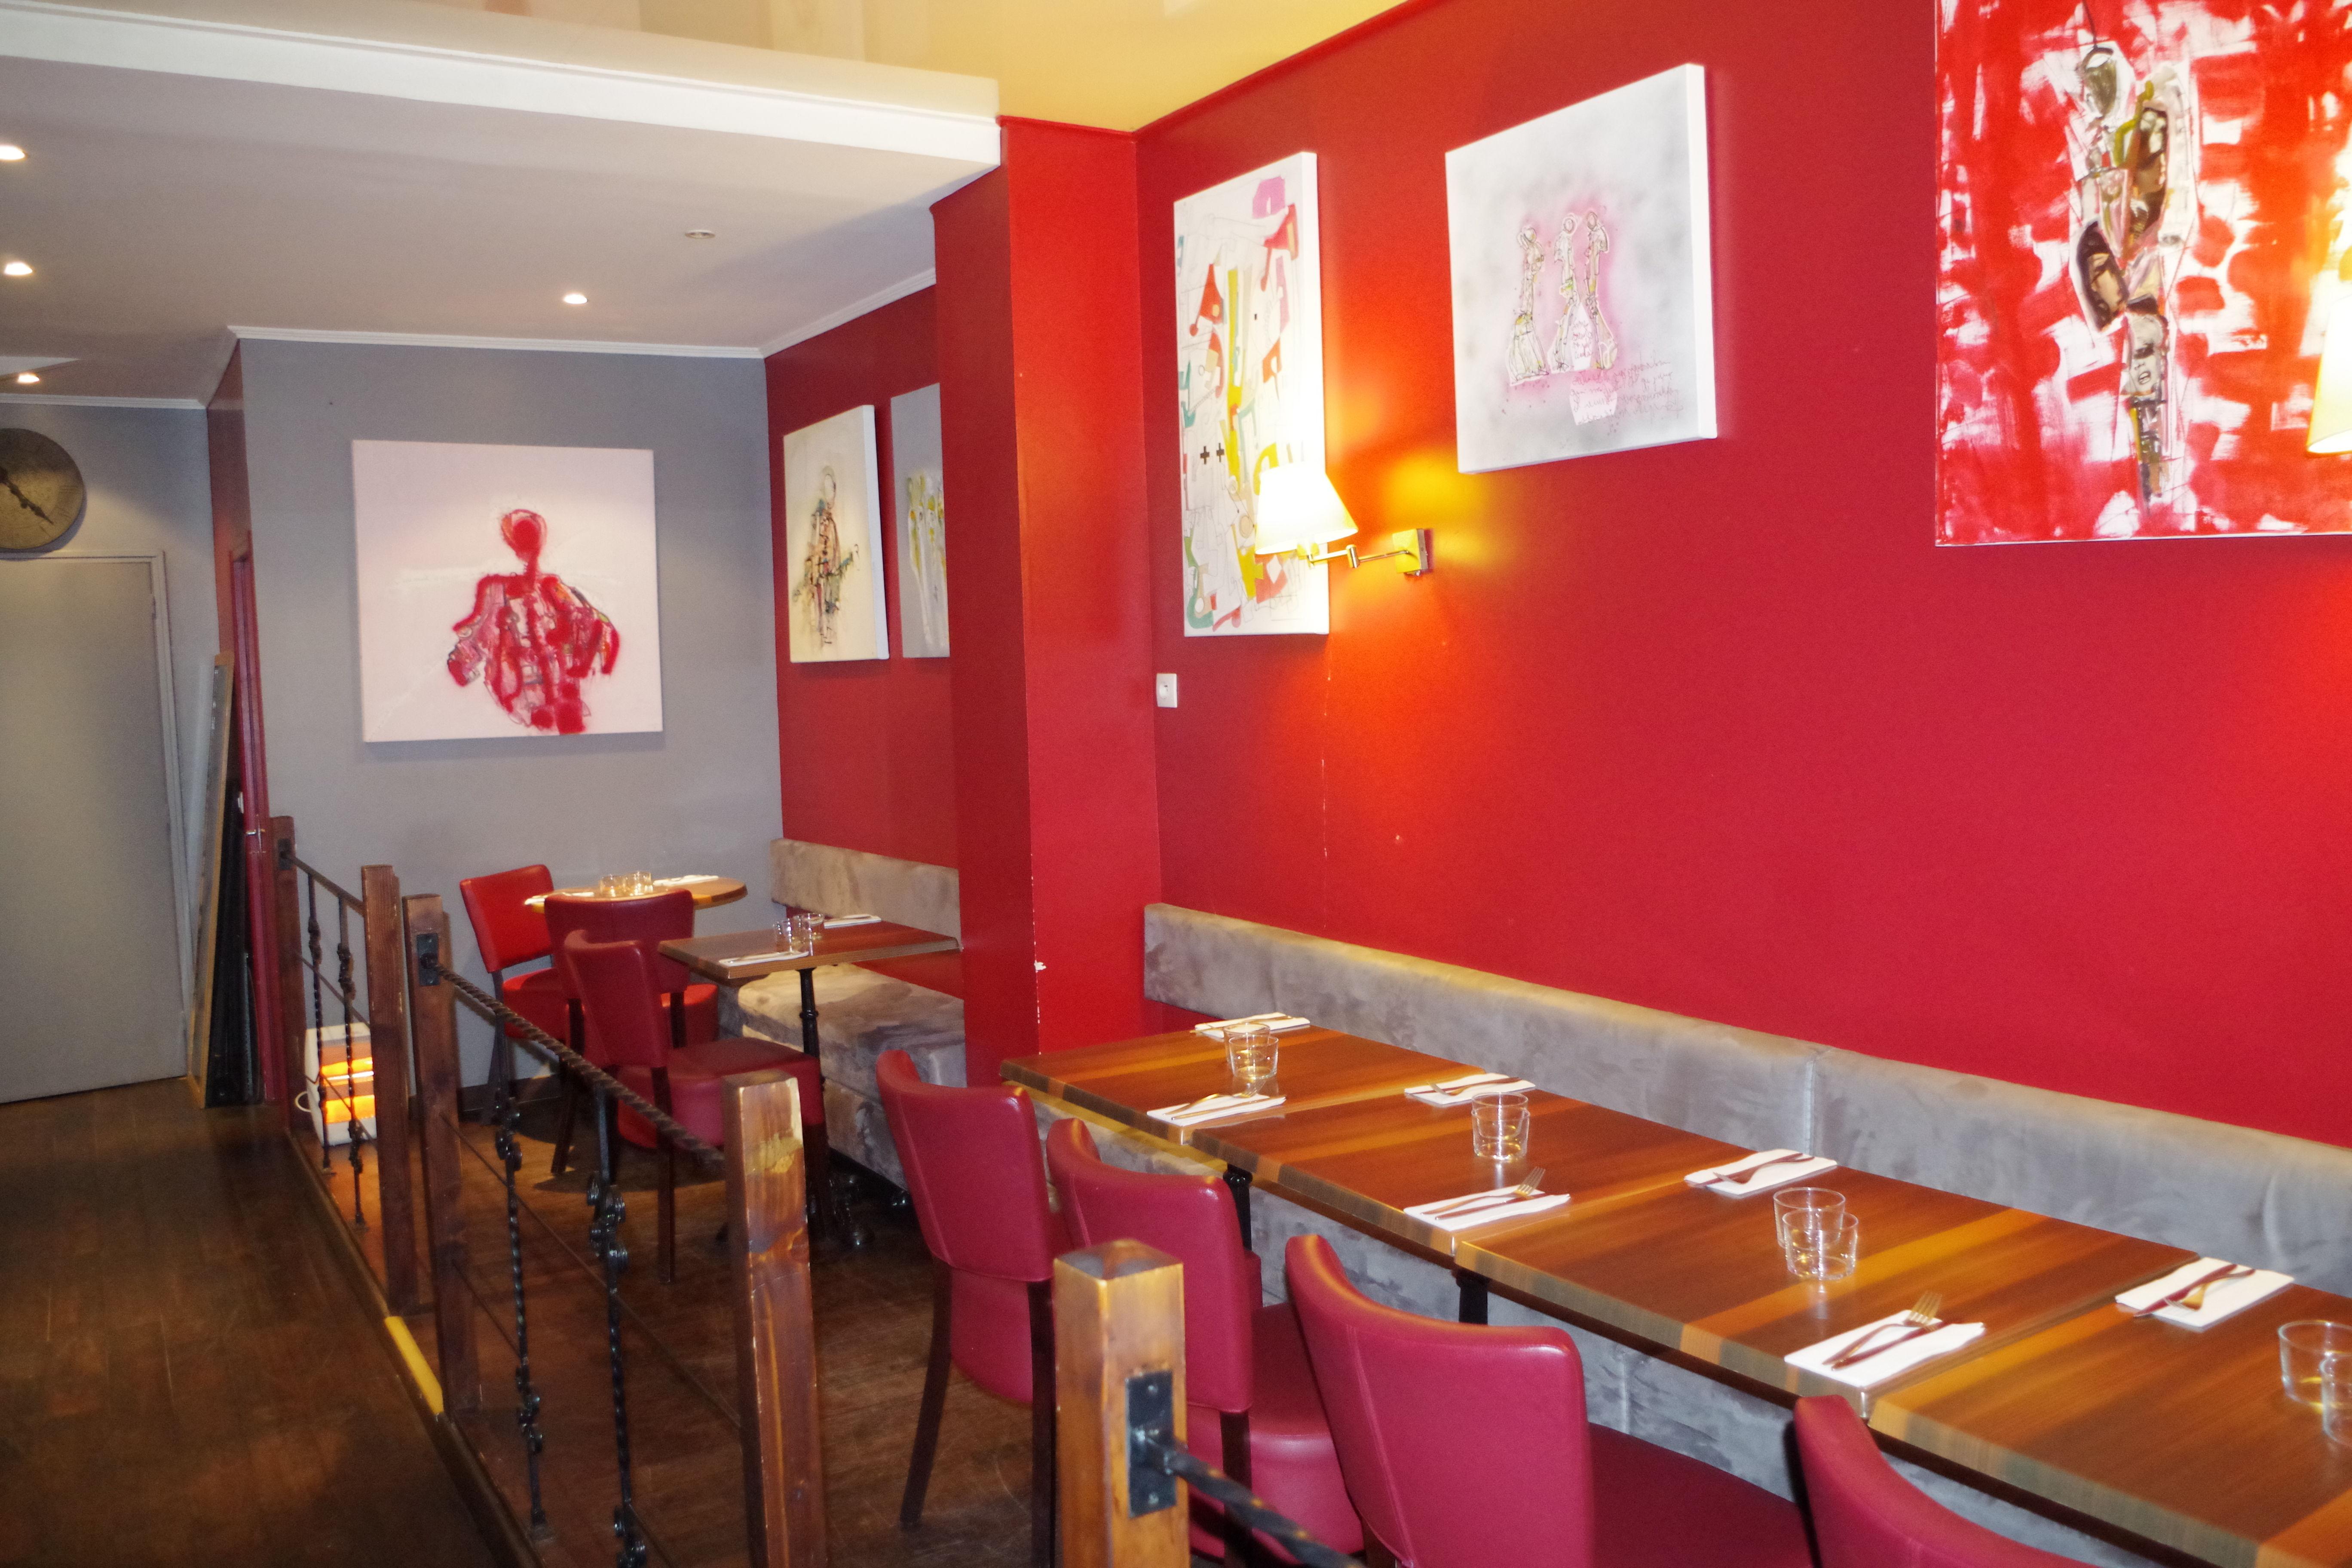 restaurant bistrot 32 la garenne colombes les trouvailles de lou. Black Bedroom Furniture Sets. Home Design Ideas